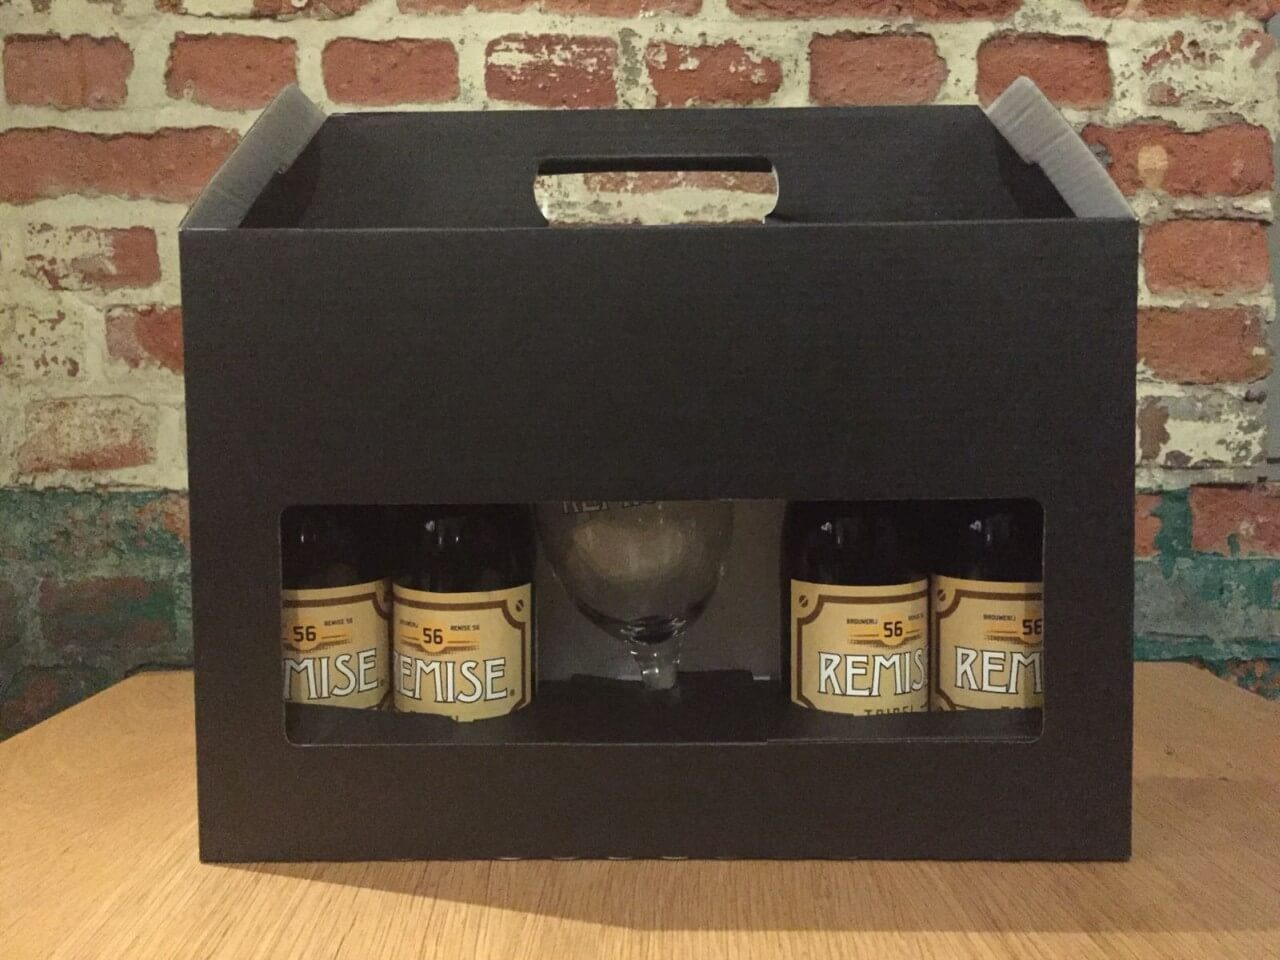 Geschenk koffer met Remise 56 Tripel en Glas